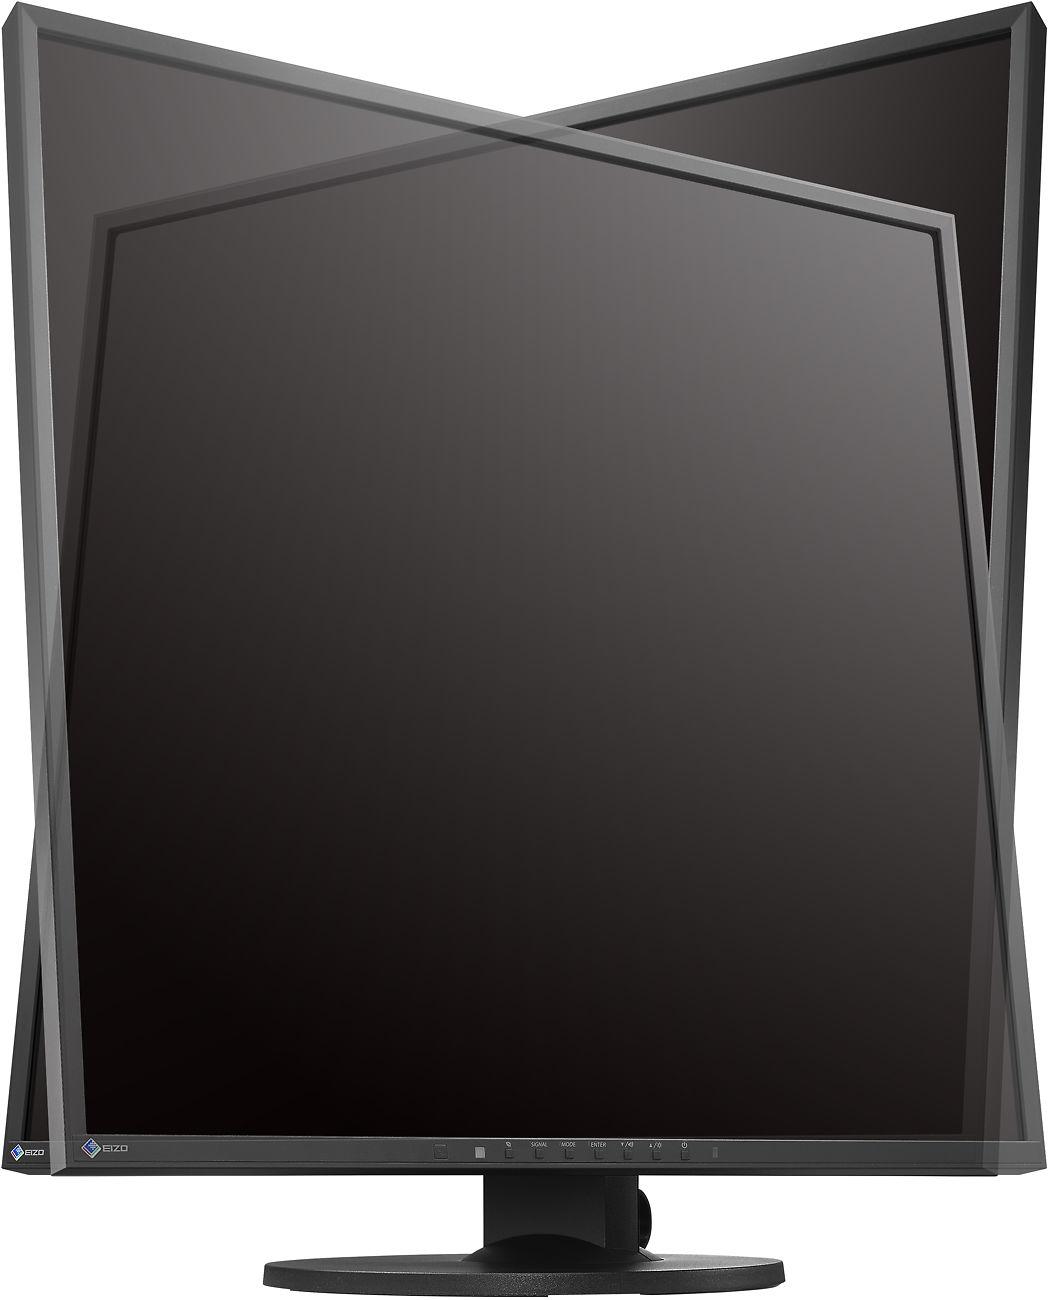 "Eizo Flexscan EV2730Q 27"" Monitor Image"